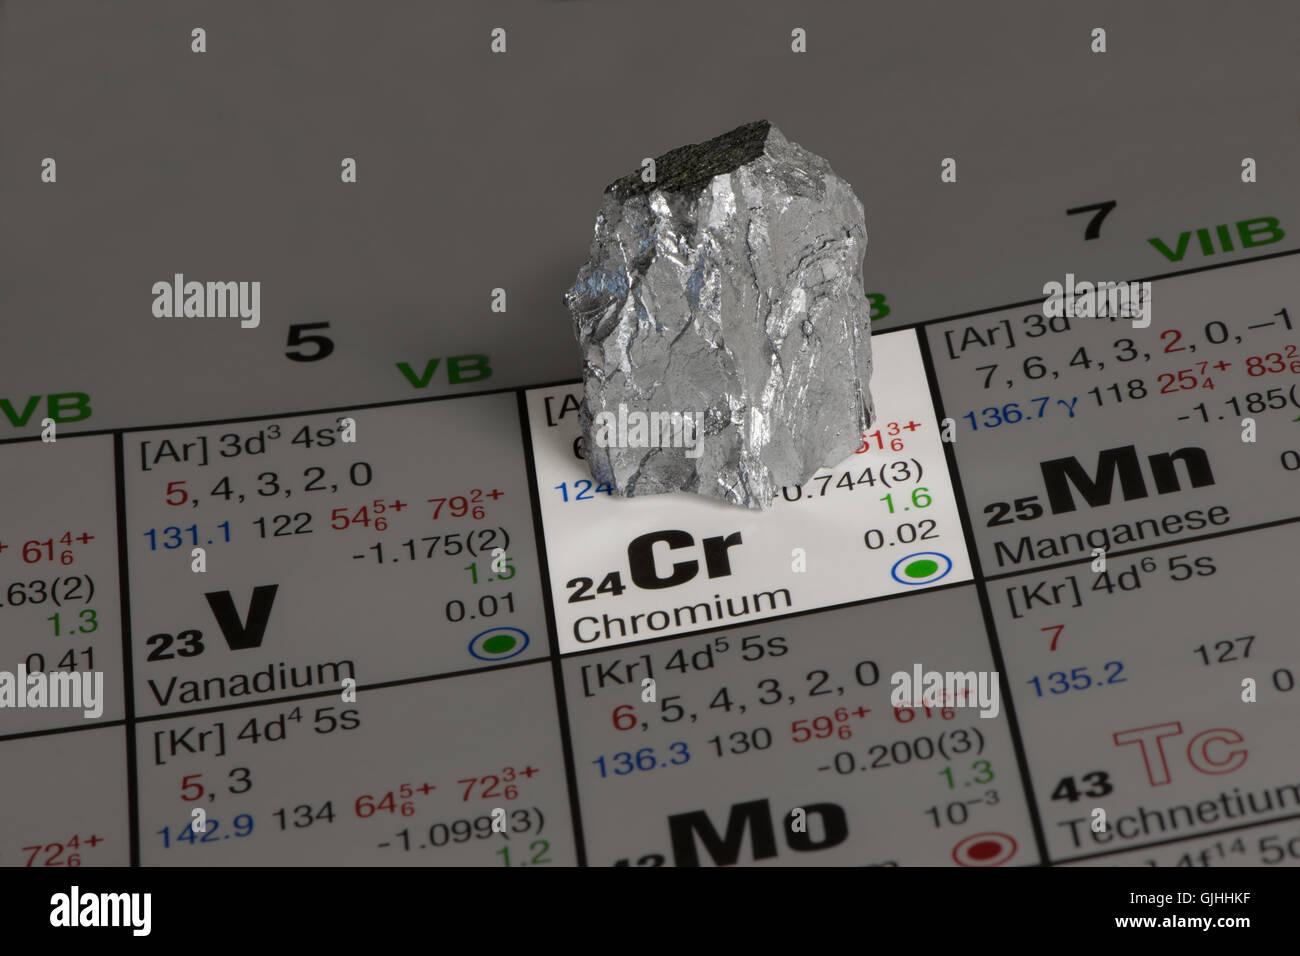 Chromium on periodic table of elements stock photo royalty free chromium on periodic table of elements gamestrikefo Choice Image